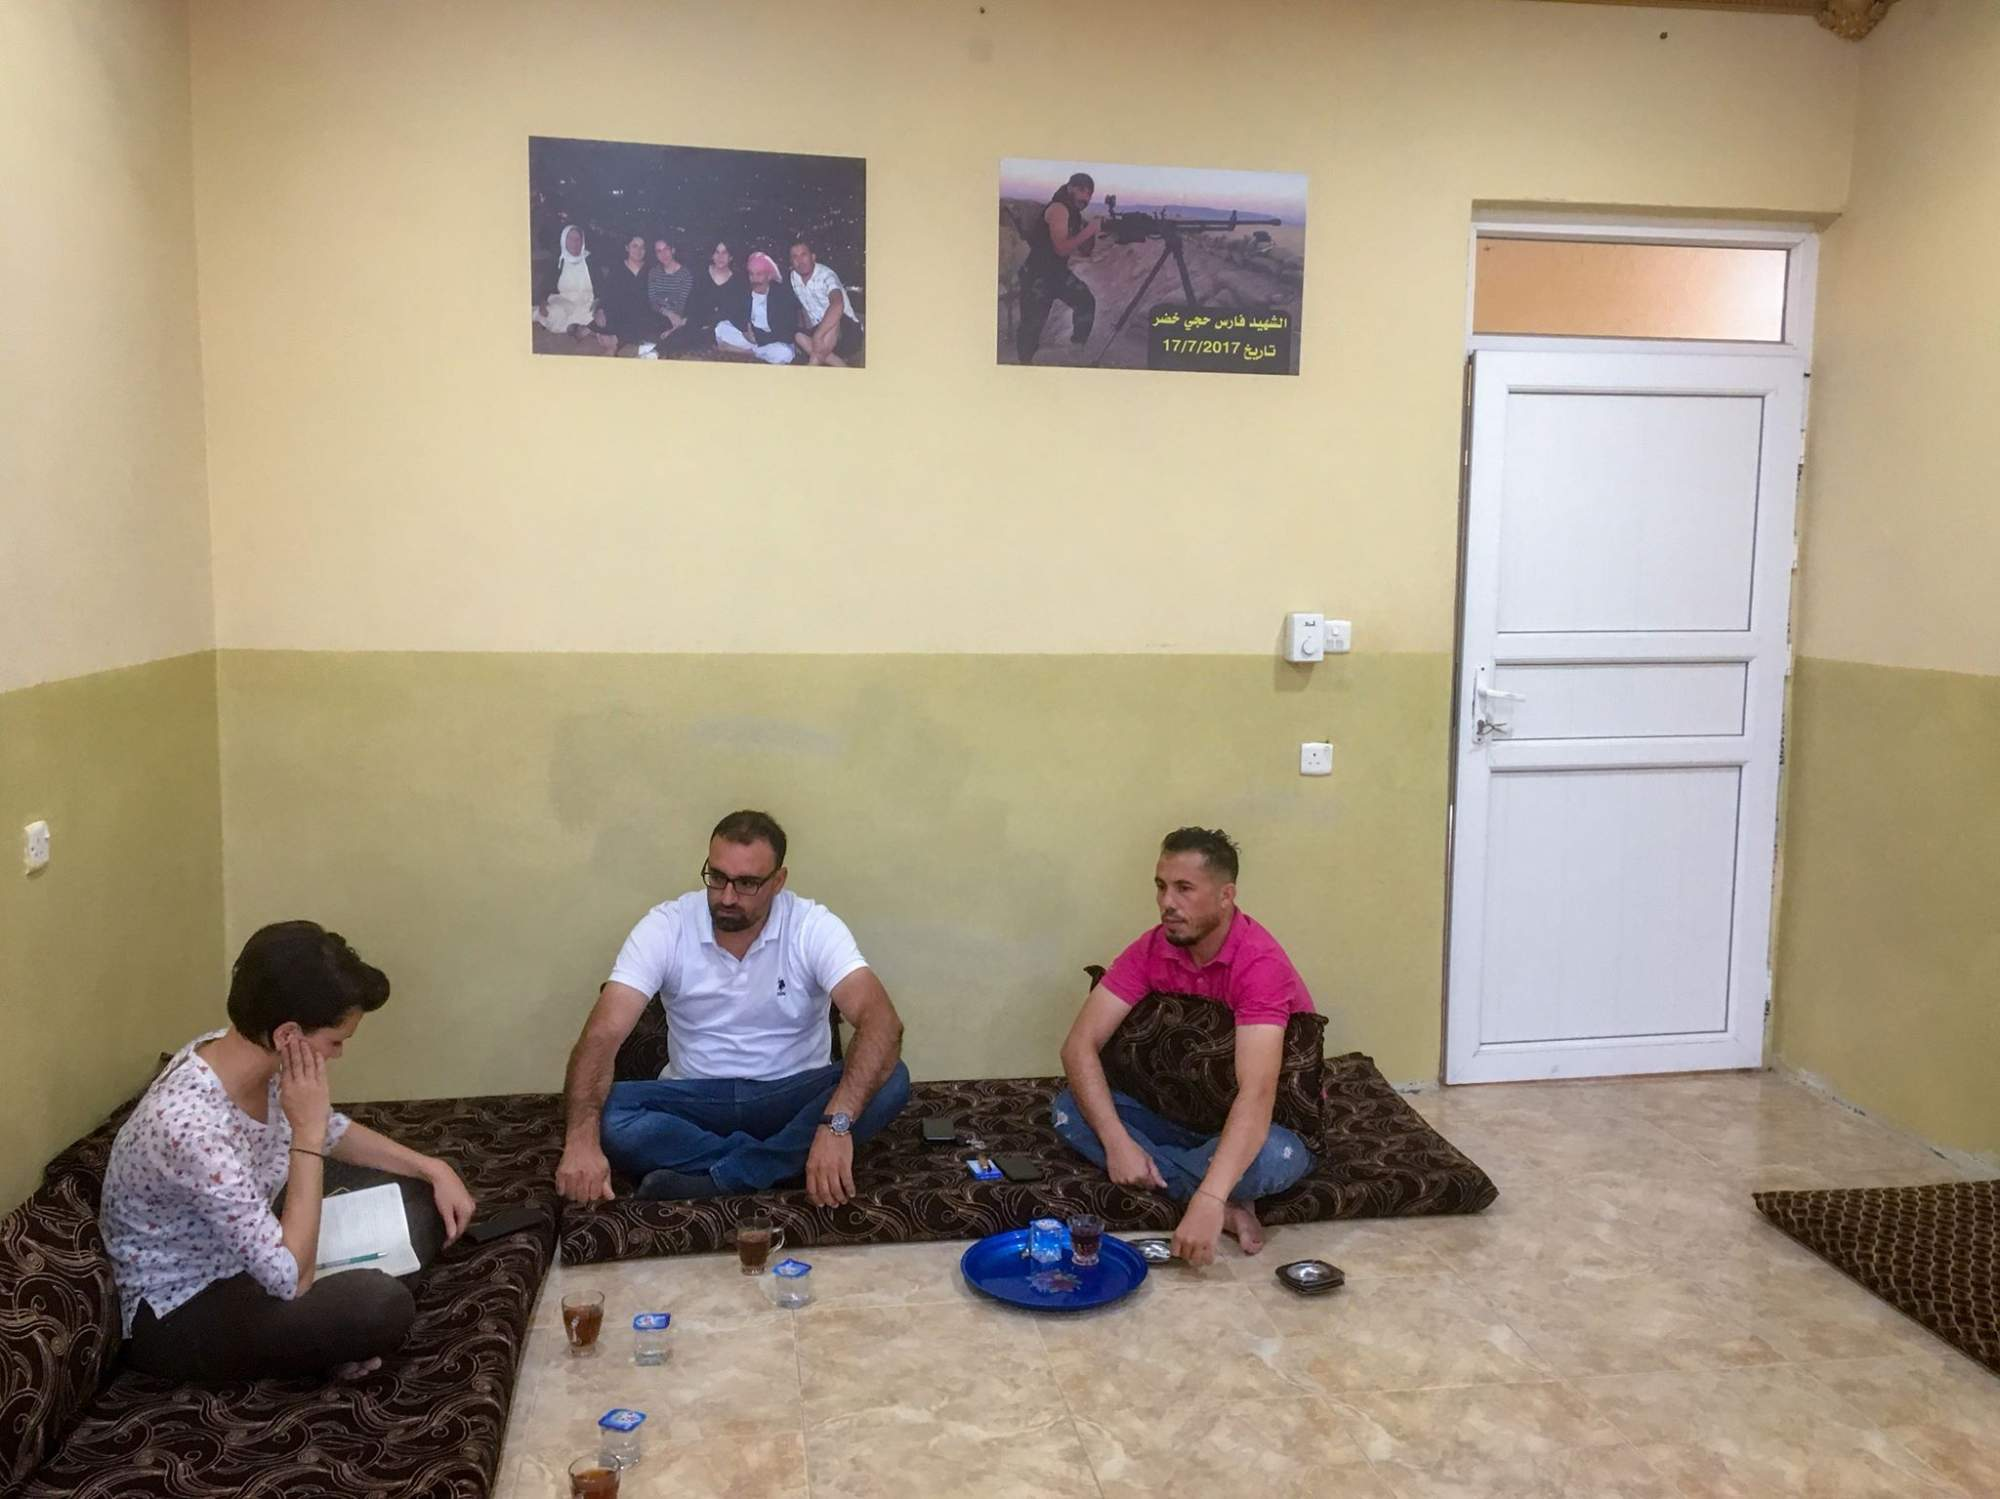 Zľava Iva Mrvová, jezídsky tlmočník a jezíd, ktorý zachraňoval ženy unesené IS. Foto: Archív Ivy Mrvovej.